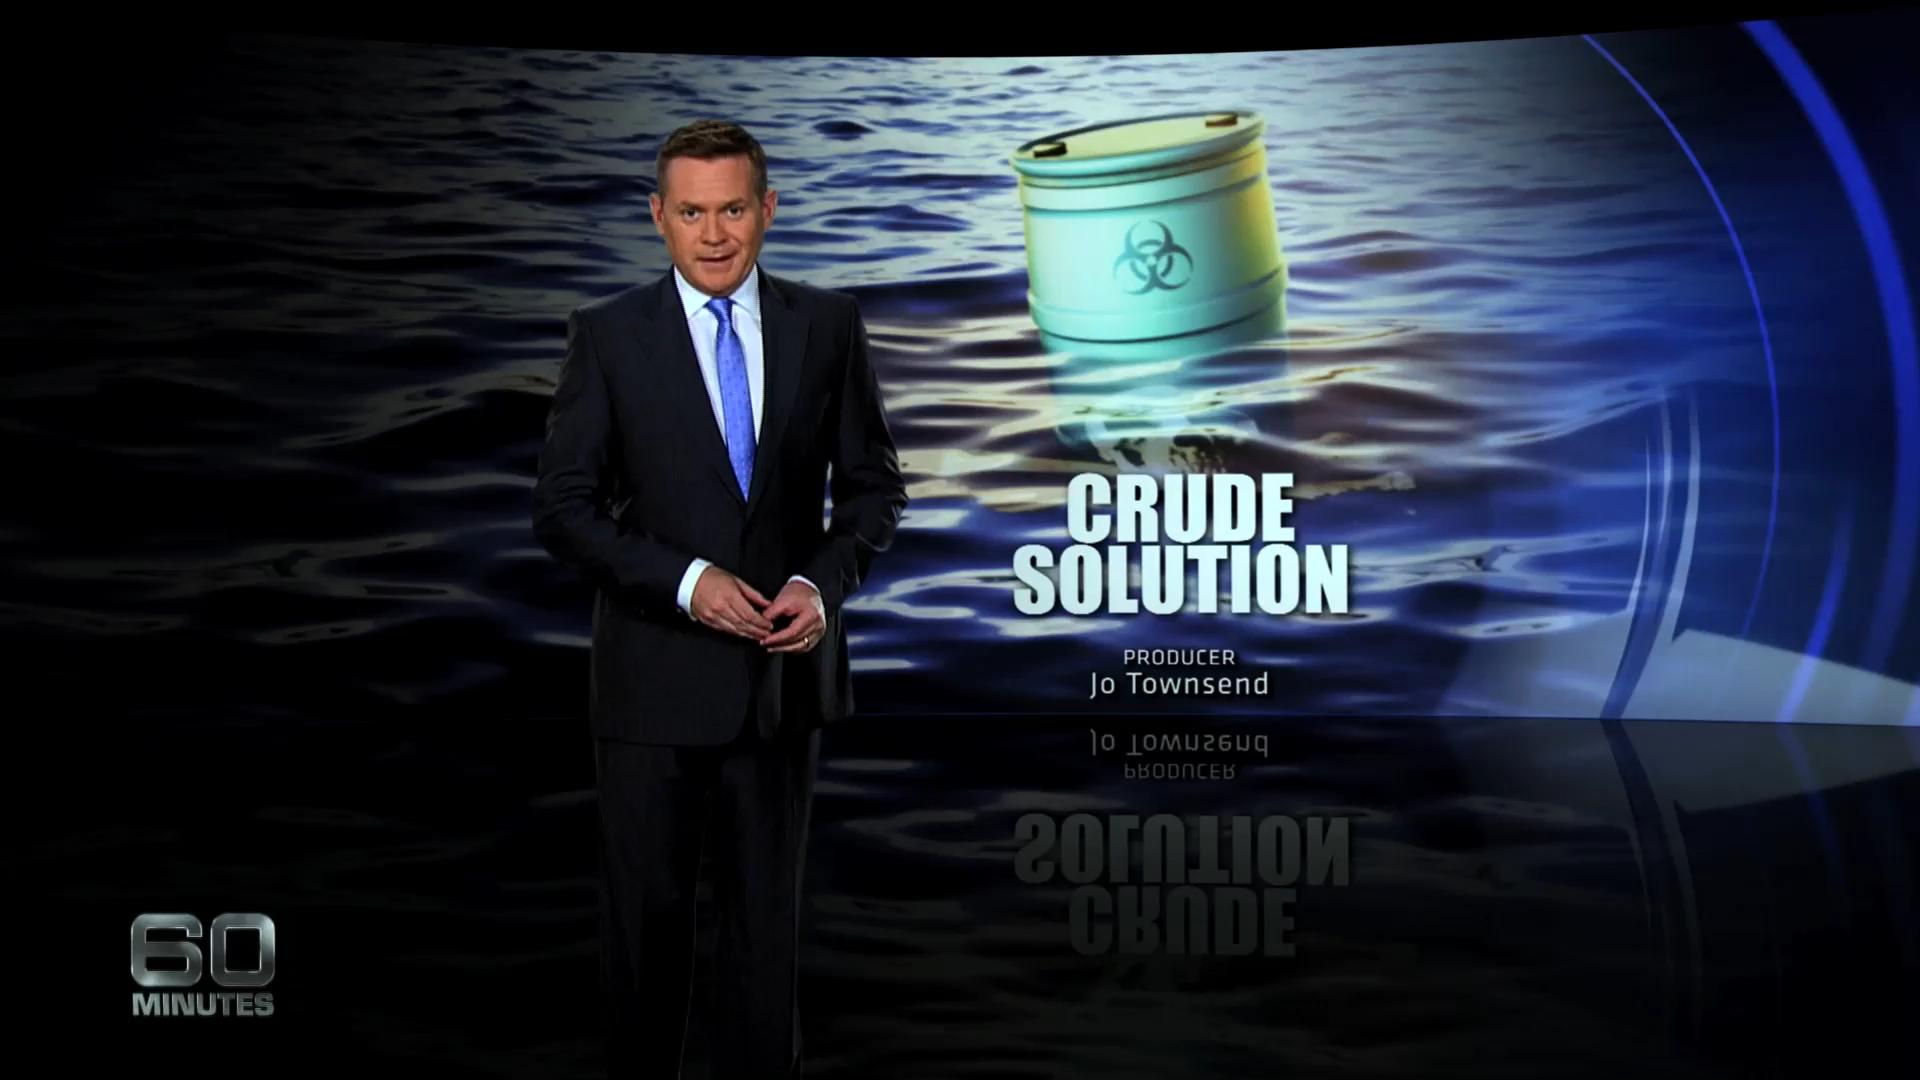 Crude Solution (2013)